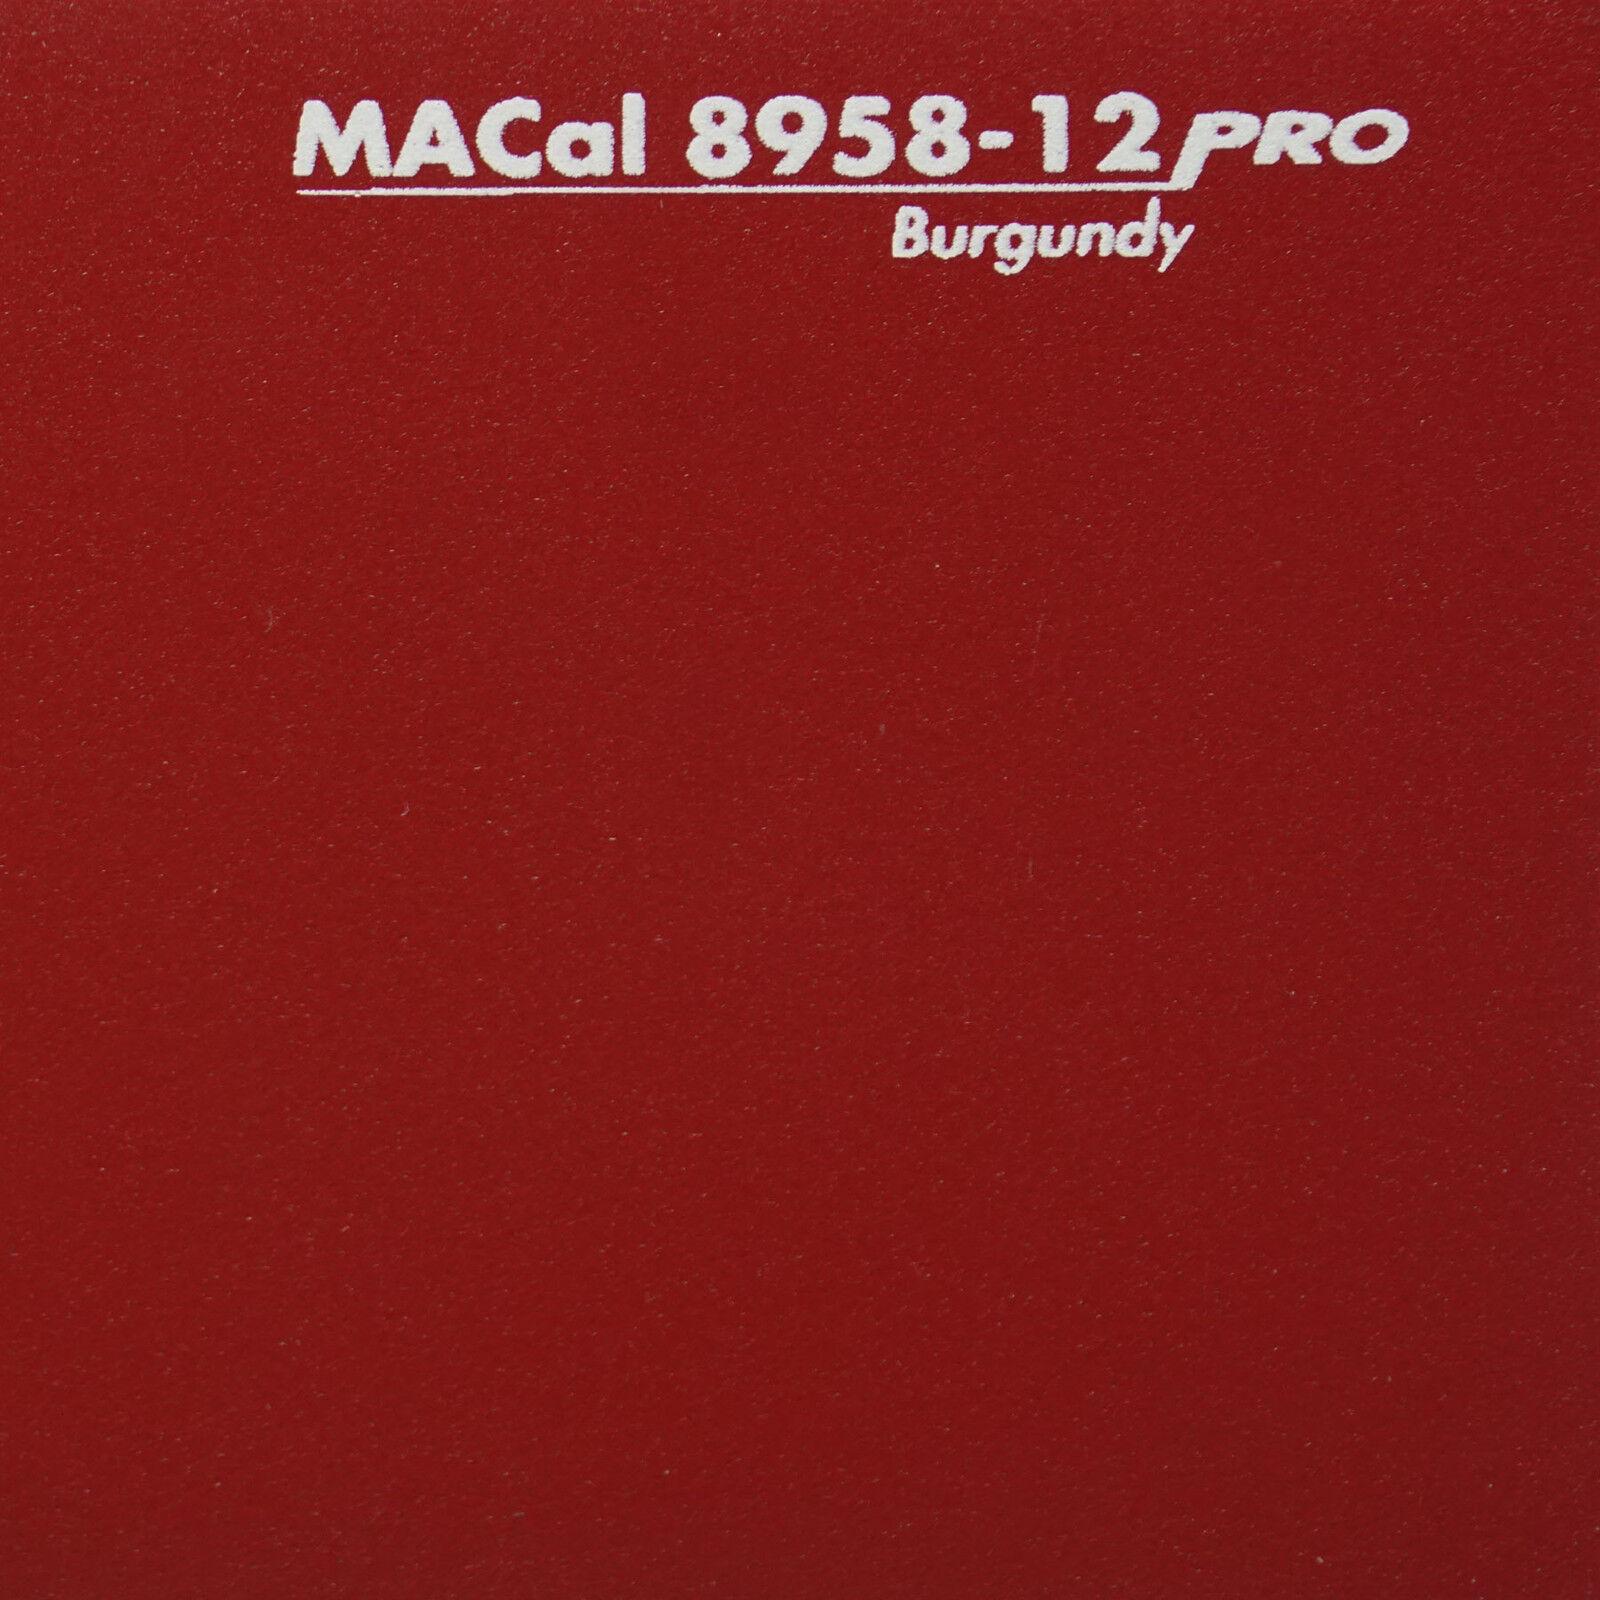 50 M ( m) m) m) decorativo autoadesivo, pellicola adesiva, anche Pellicola Adesiva Opaca Rosso Vinaccia b9d265